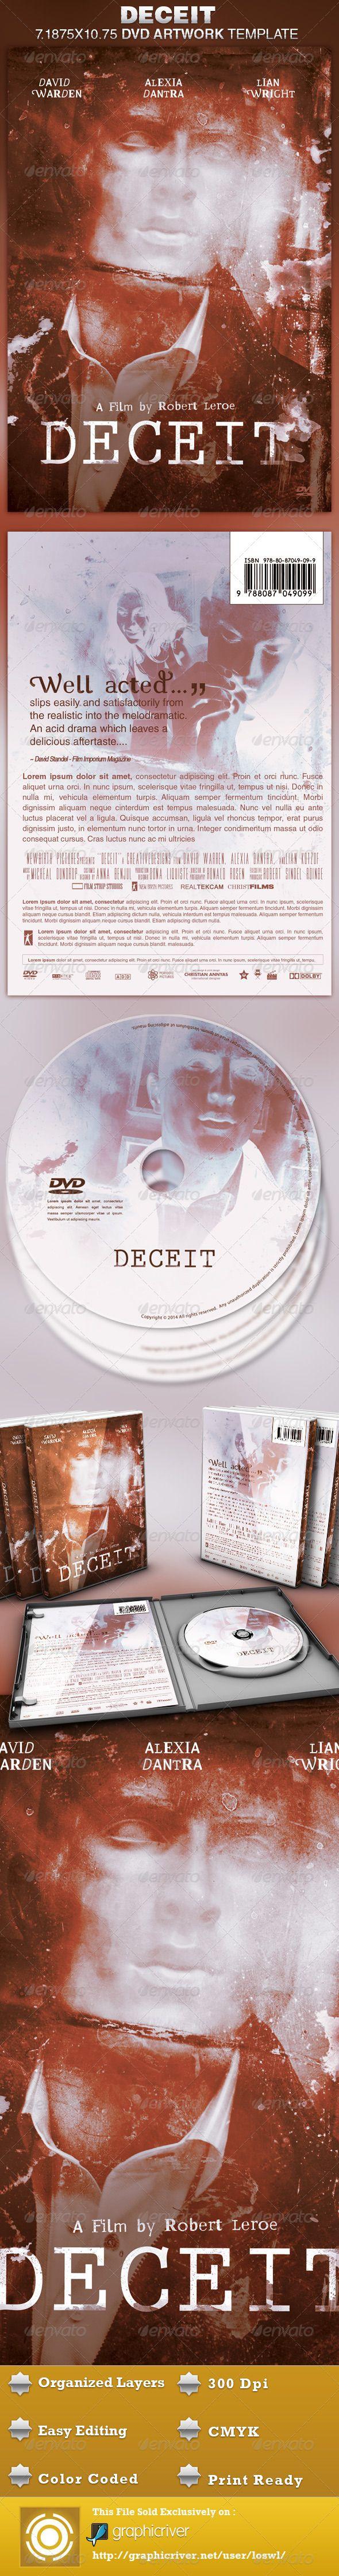 Deceit DVD Artwork Template | Photoshop